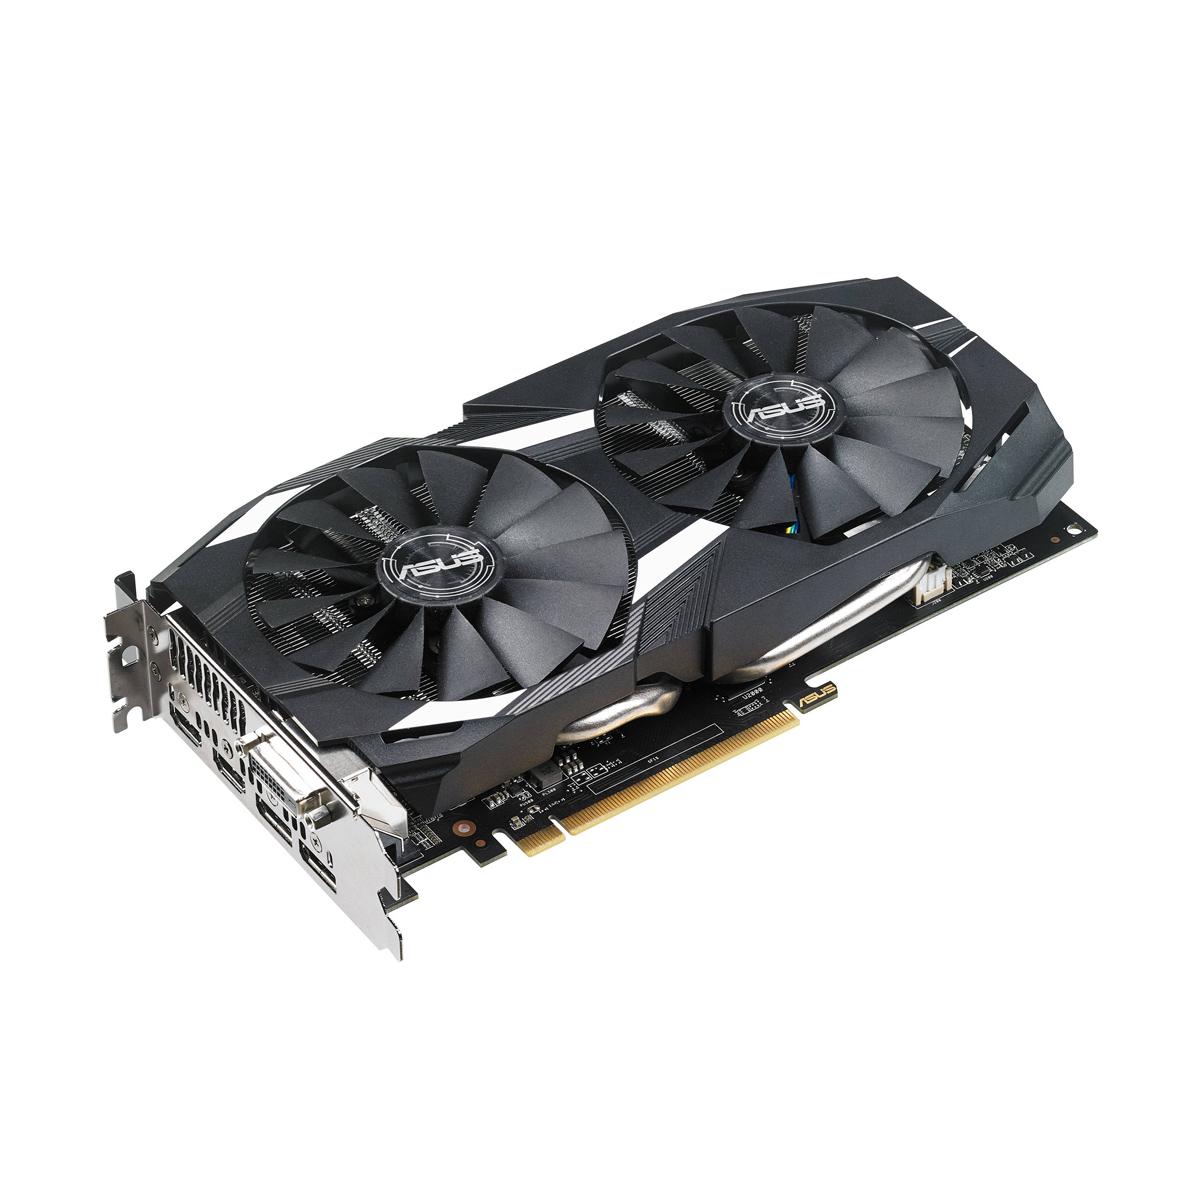 Radeon RX 560 4GB PULSE Mining Edition Graphics